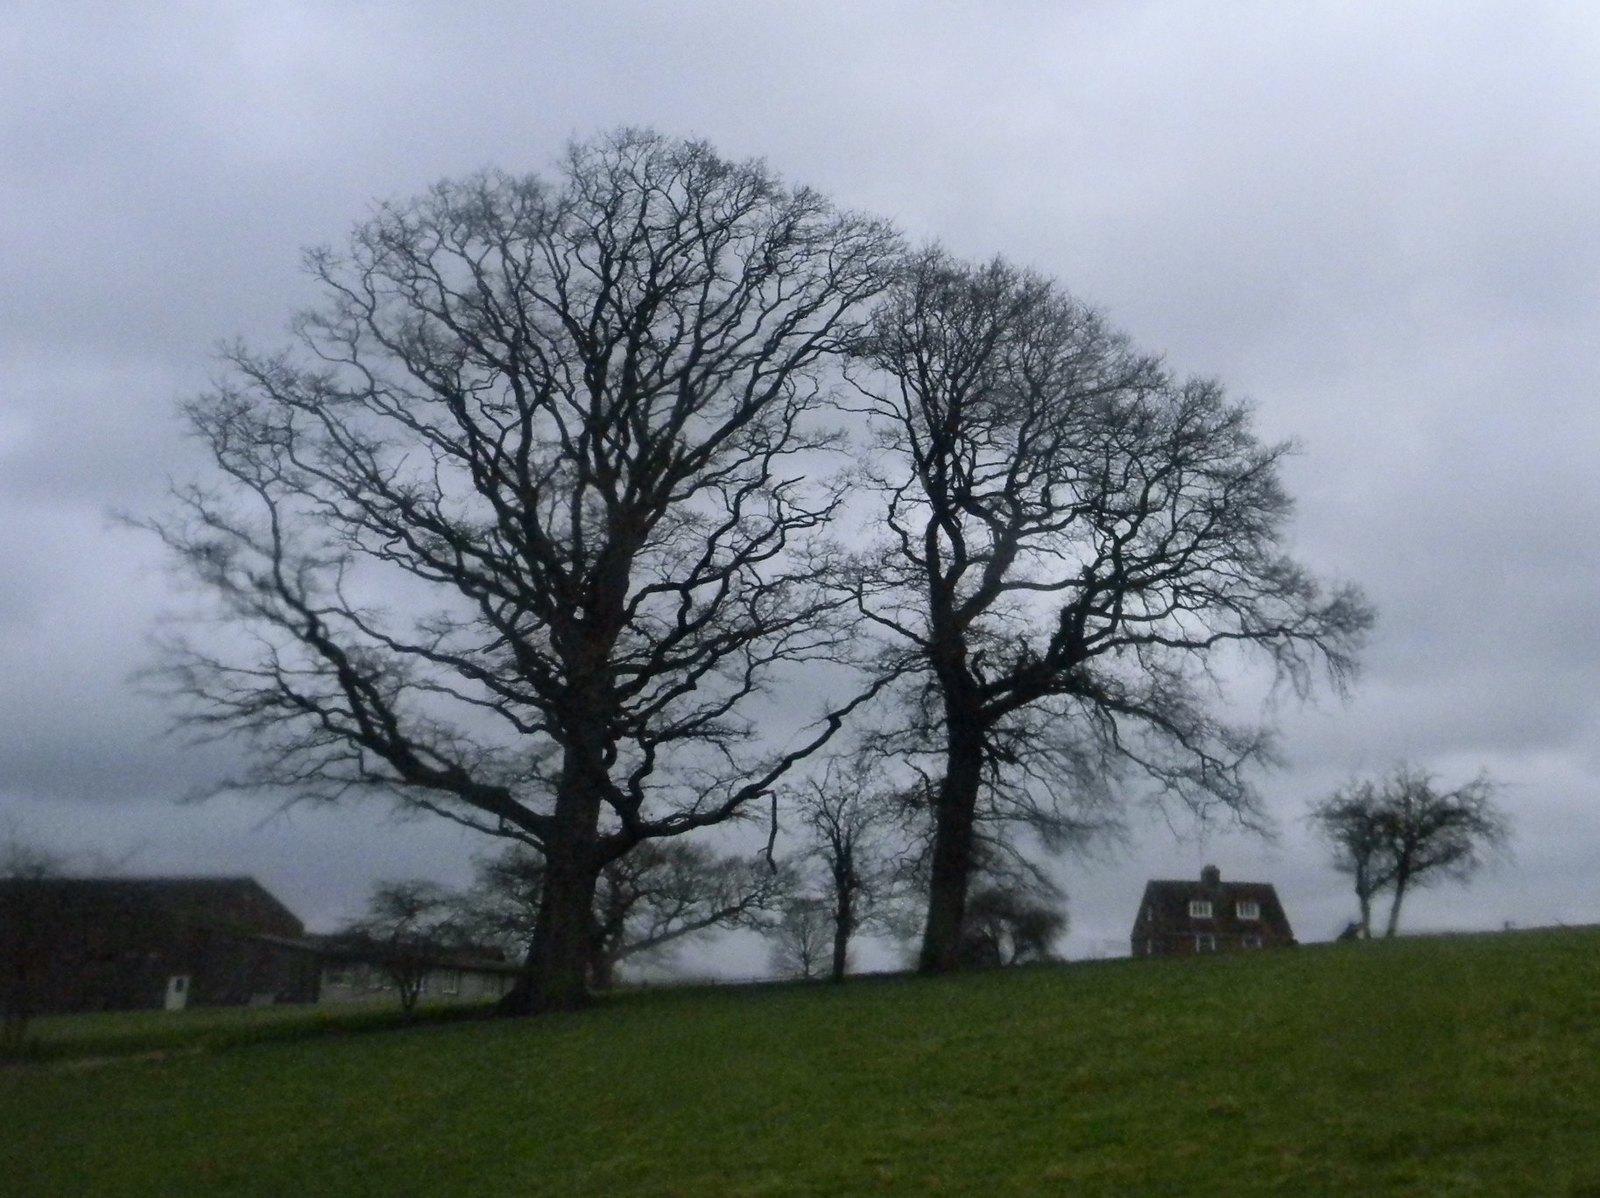 Spooky trees 2 Stonegate to Robertsbridge